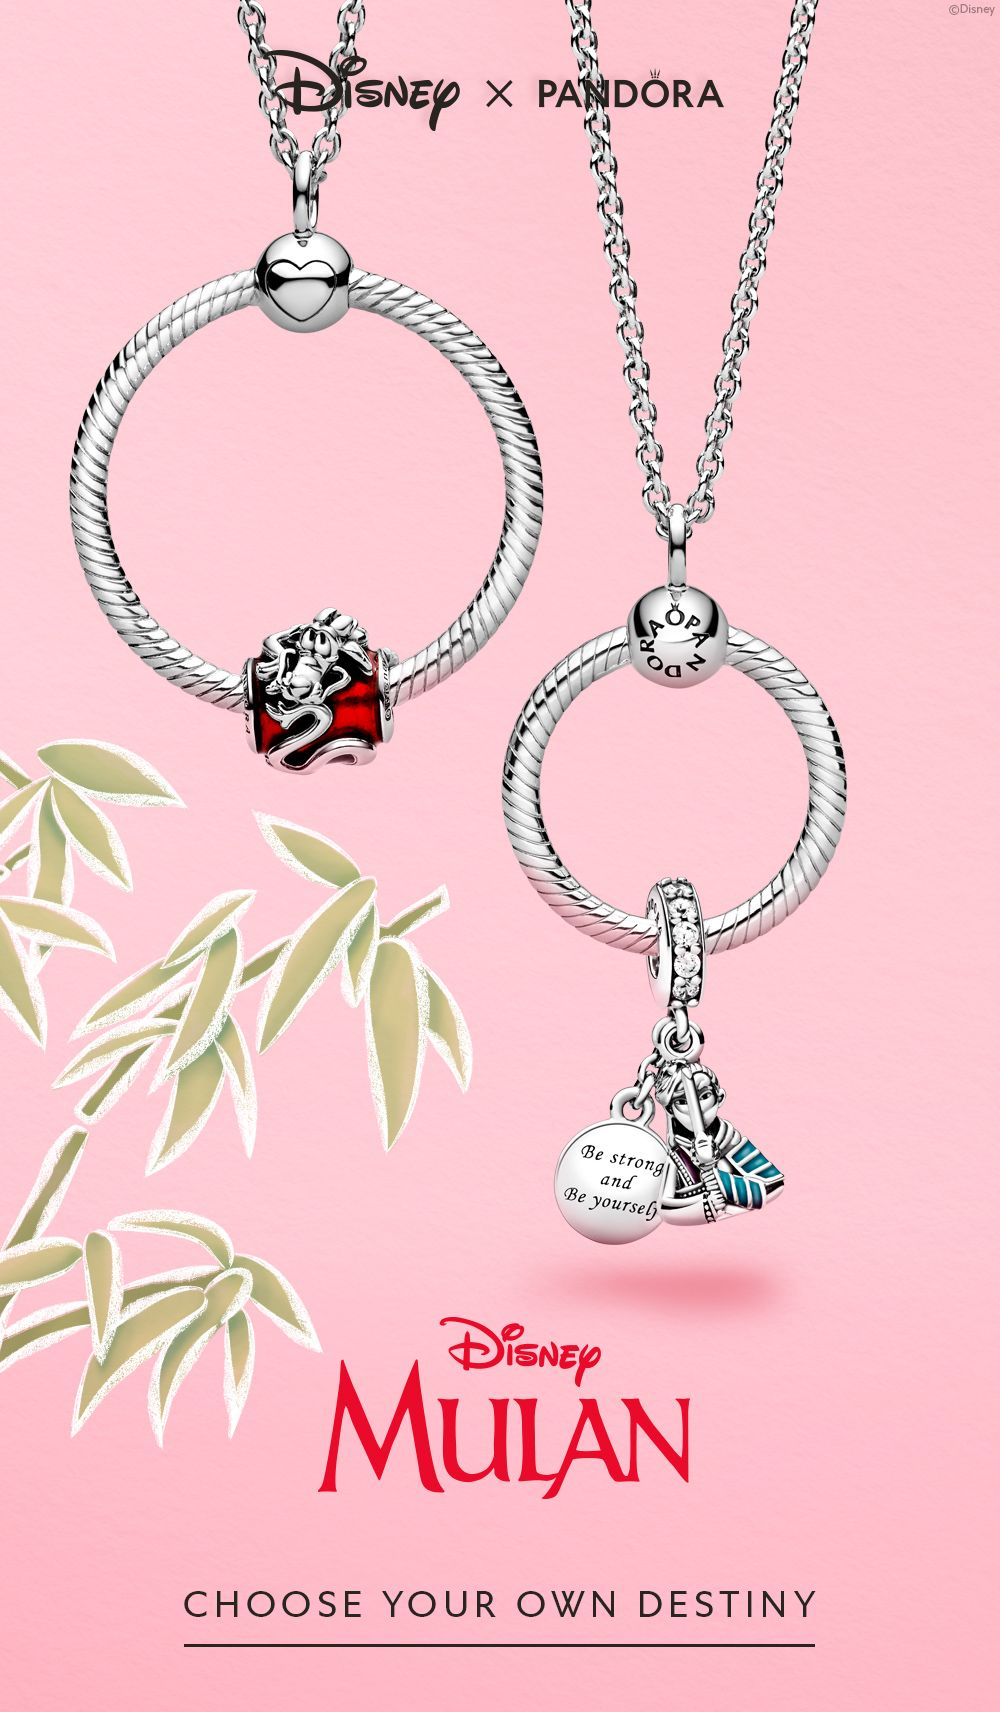 Disney Mulan x Pandora | Disney pandora bracelet charms, Pandora ...